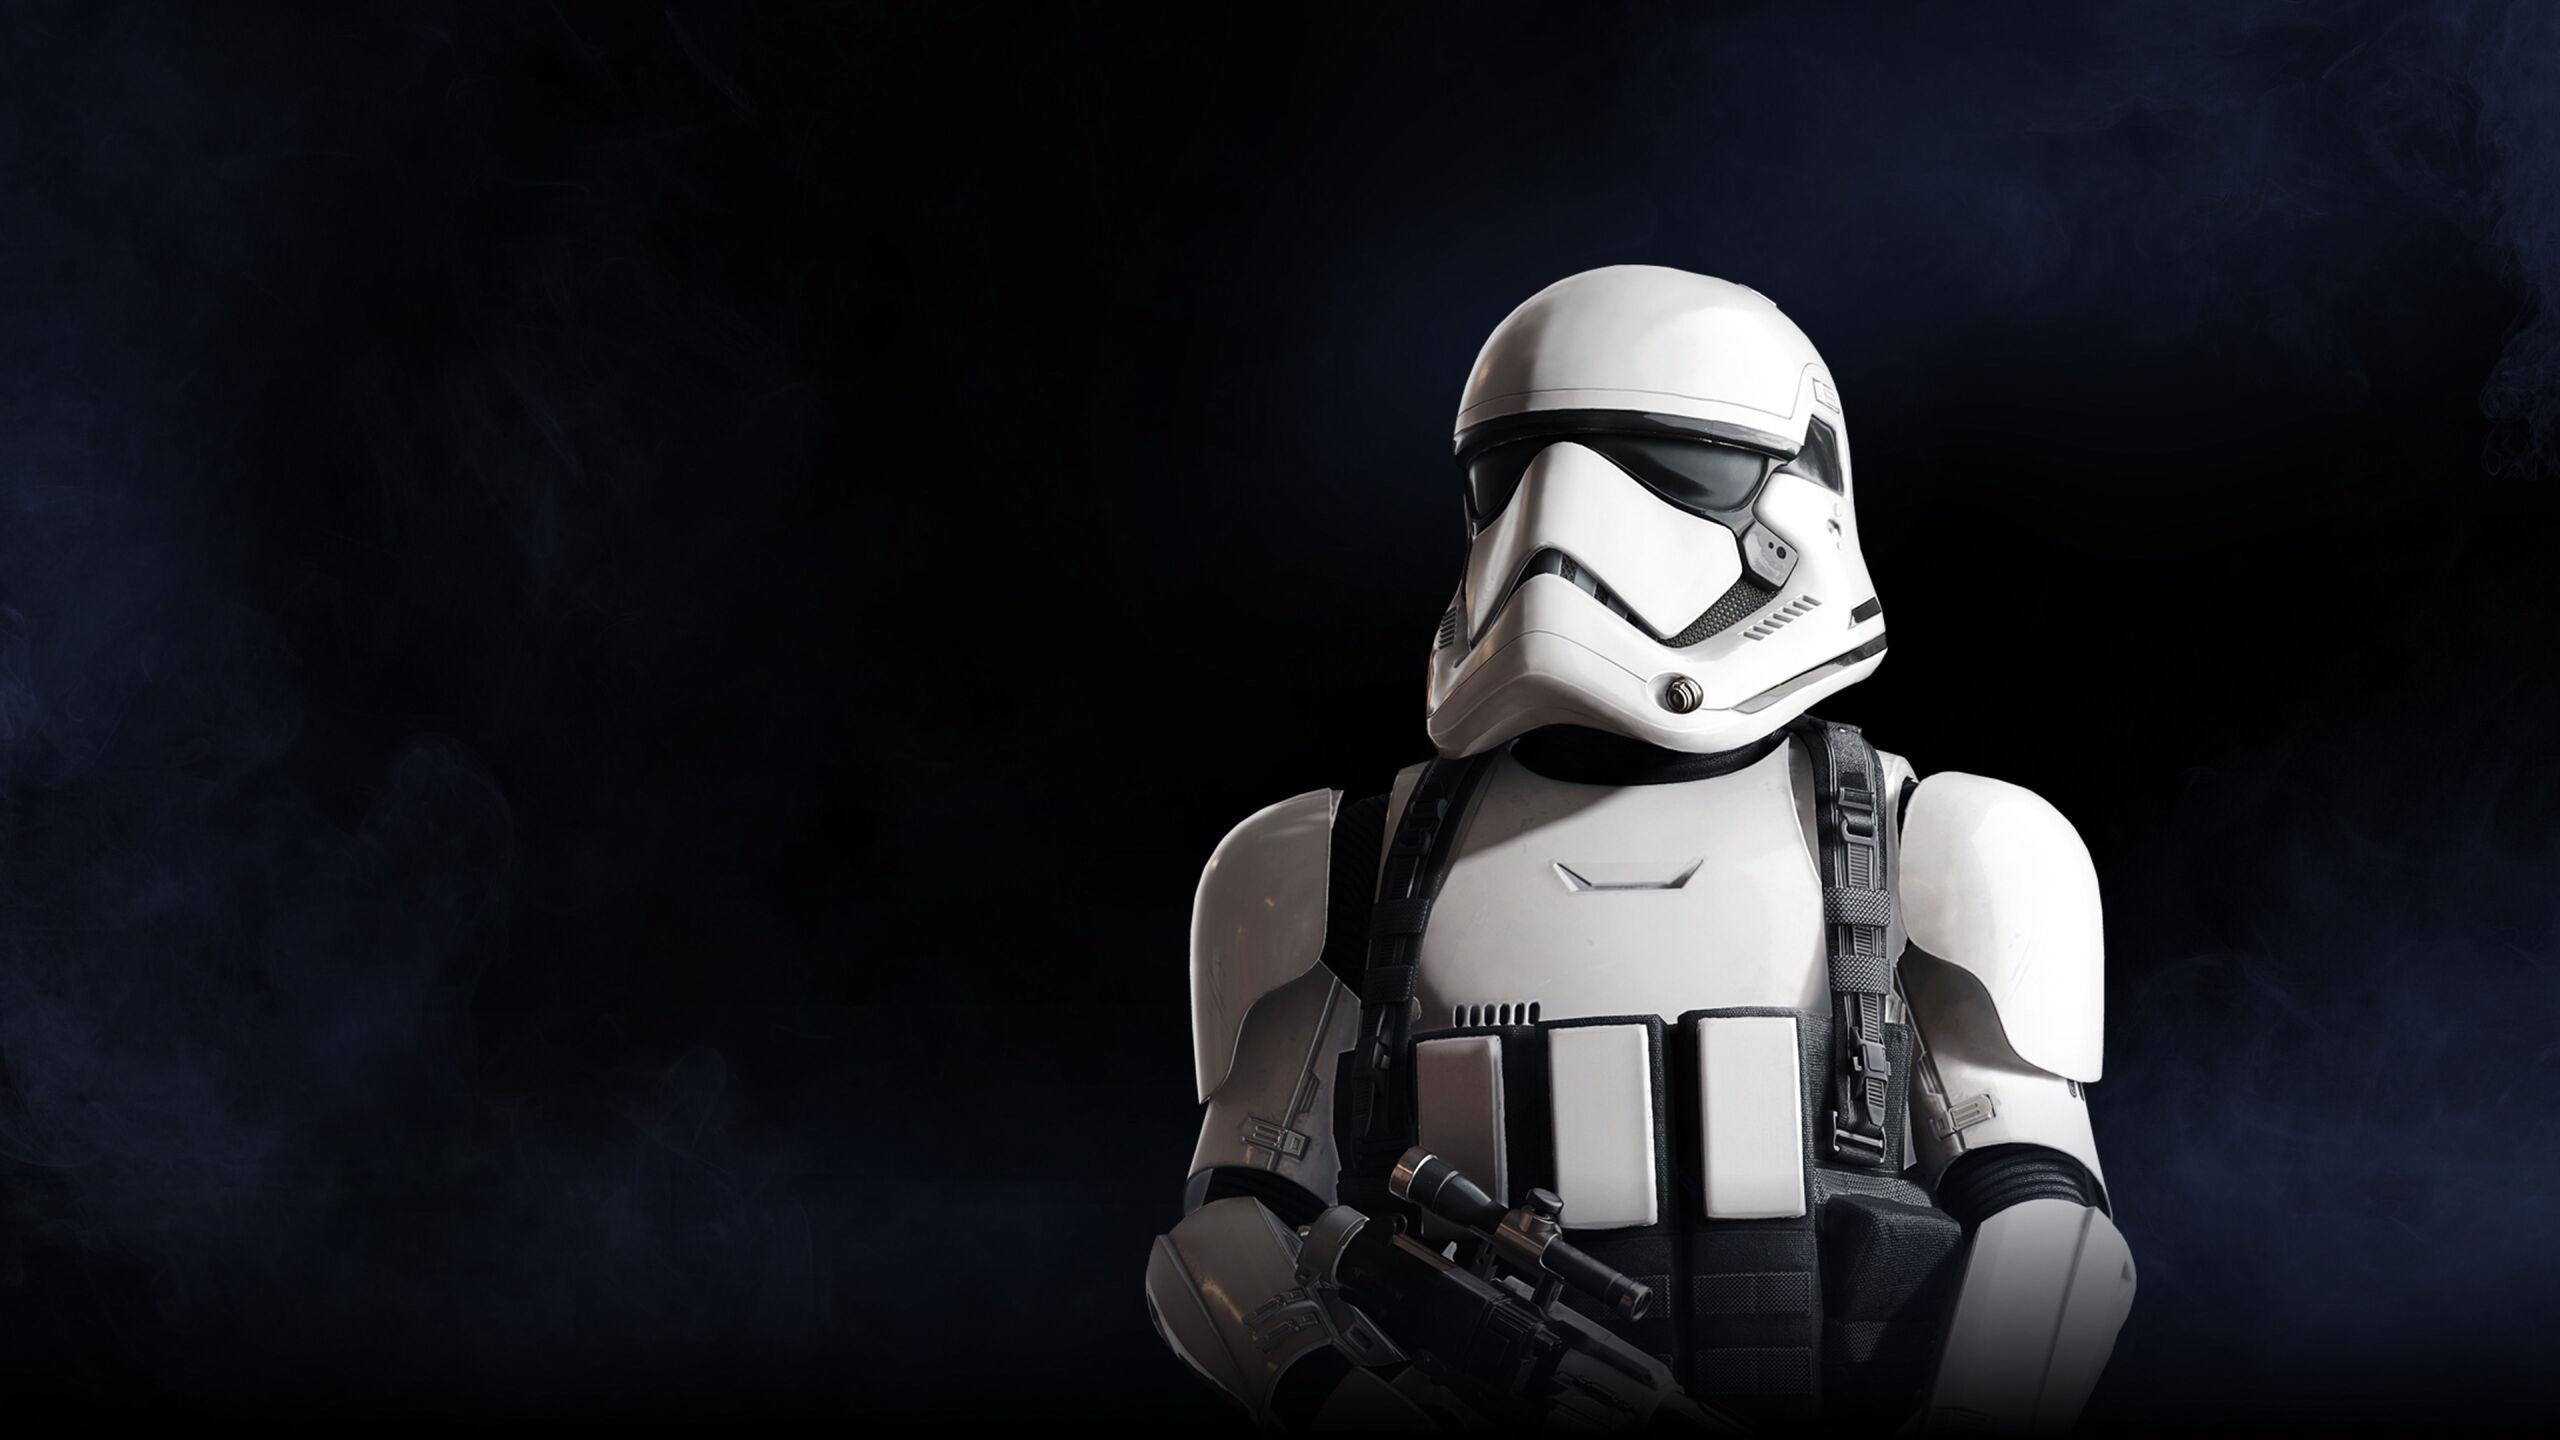 2560x1440 Stormtrooper Star Wars Battlefront 2 5k 1440P ...